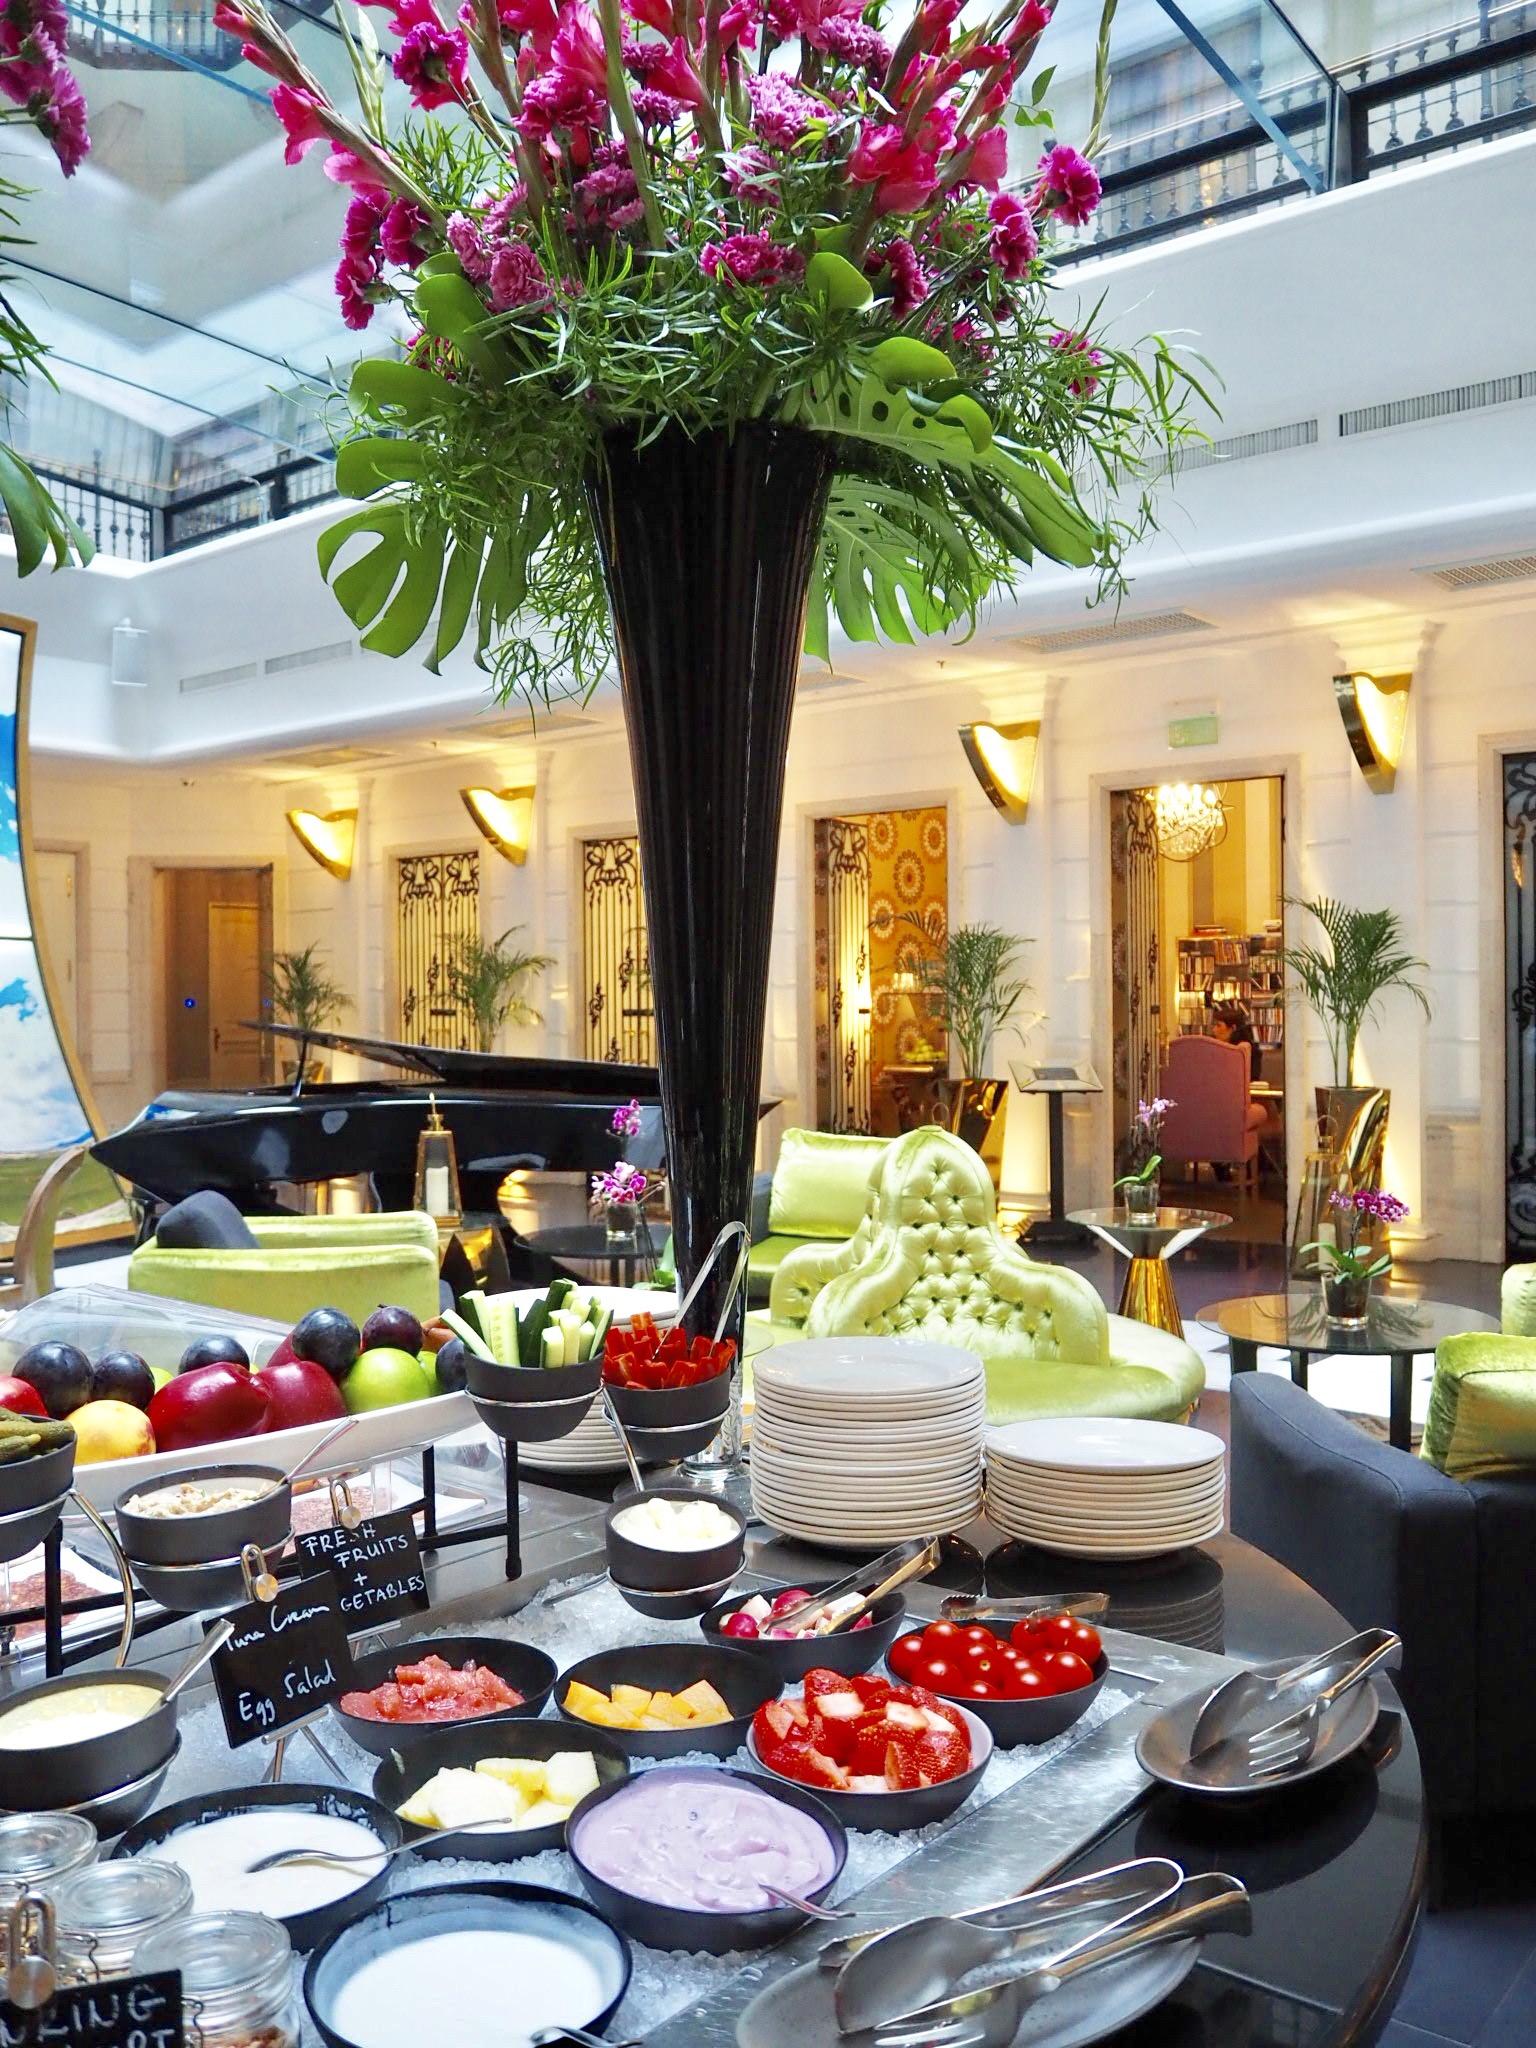 img 4445 - Aria Hotel Budapest HARMONY SPA - 旅の途中の休息時間。ブダペストでのご褒美スパ